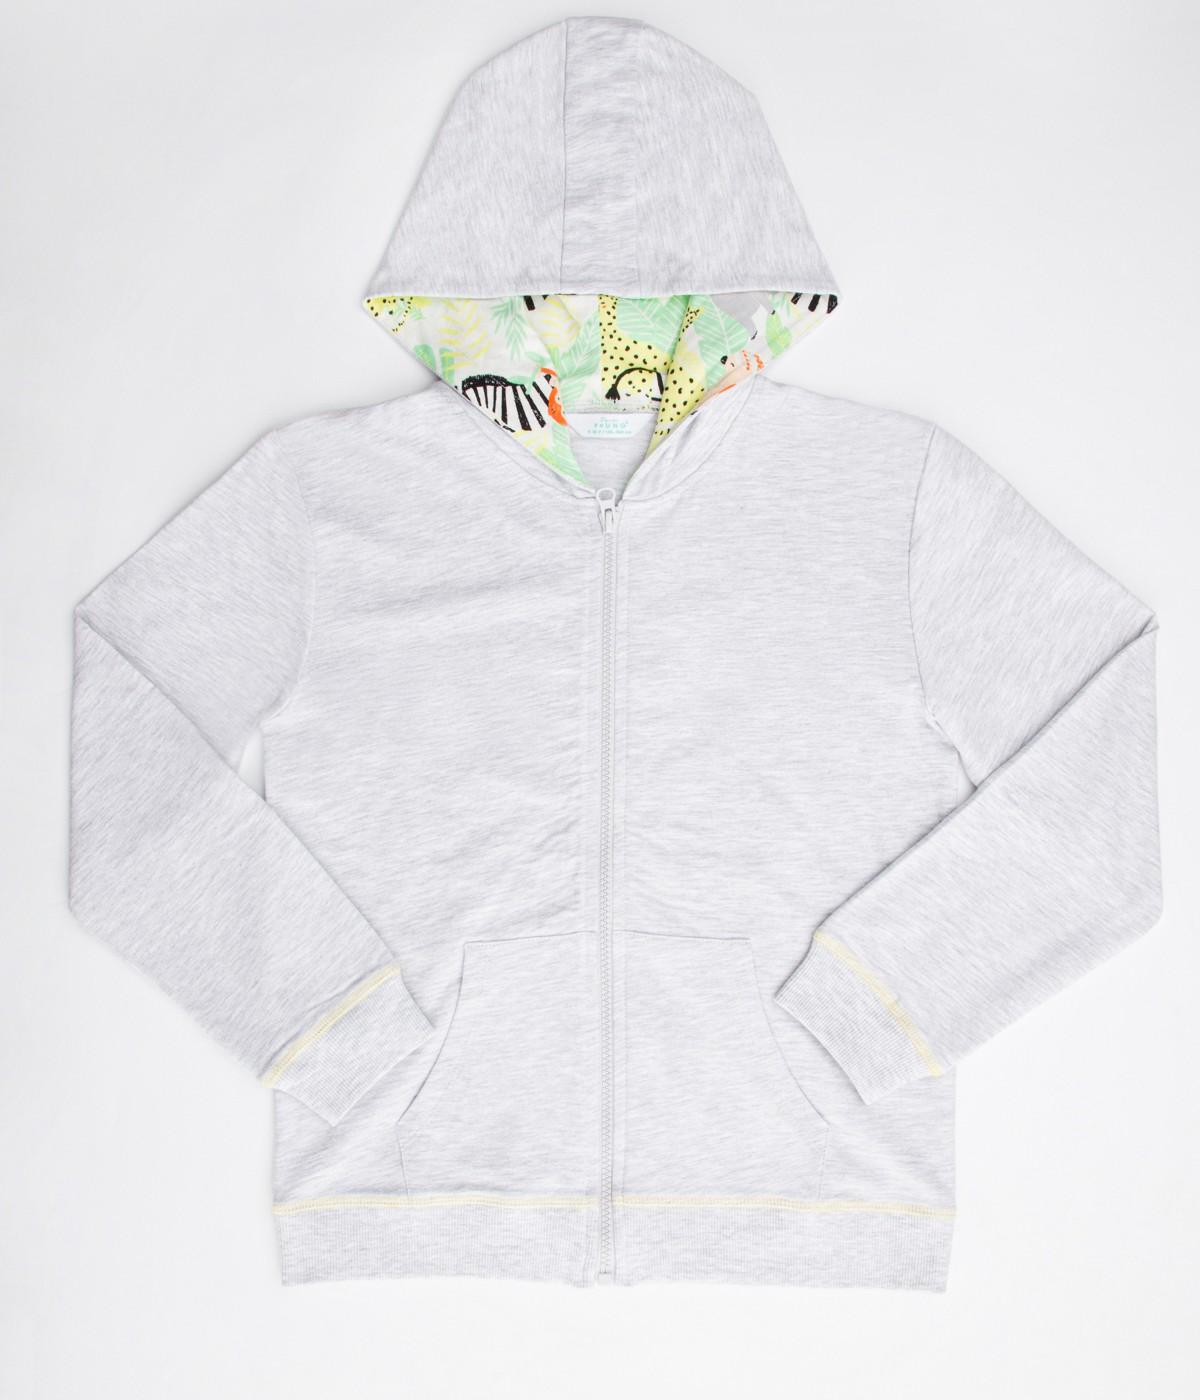 Copil LD Hood Sweatshirt